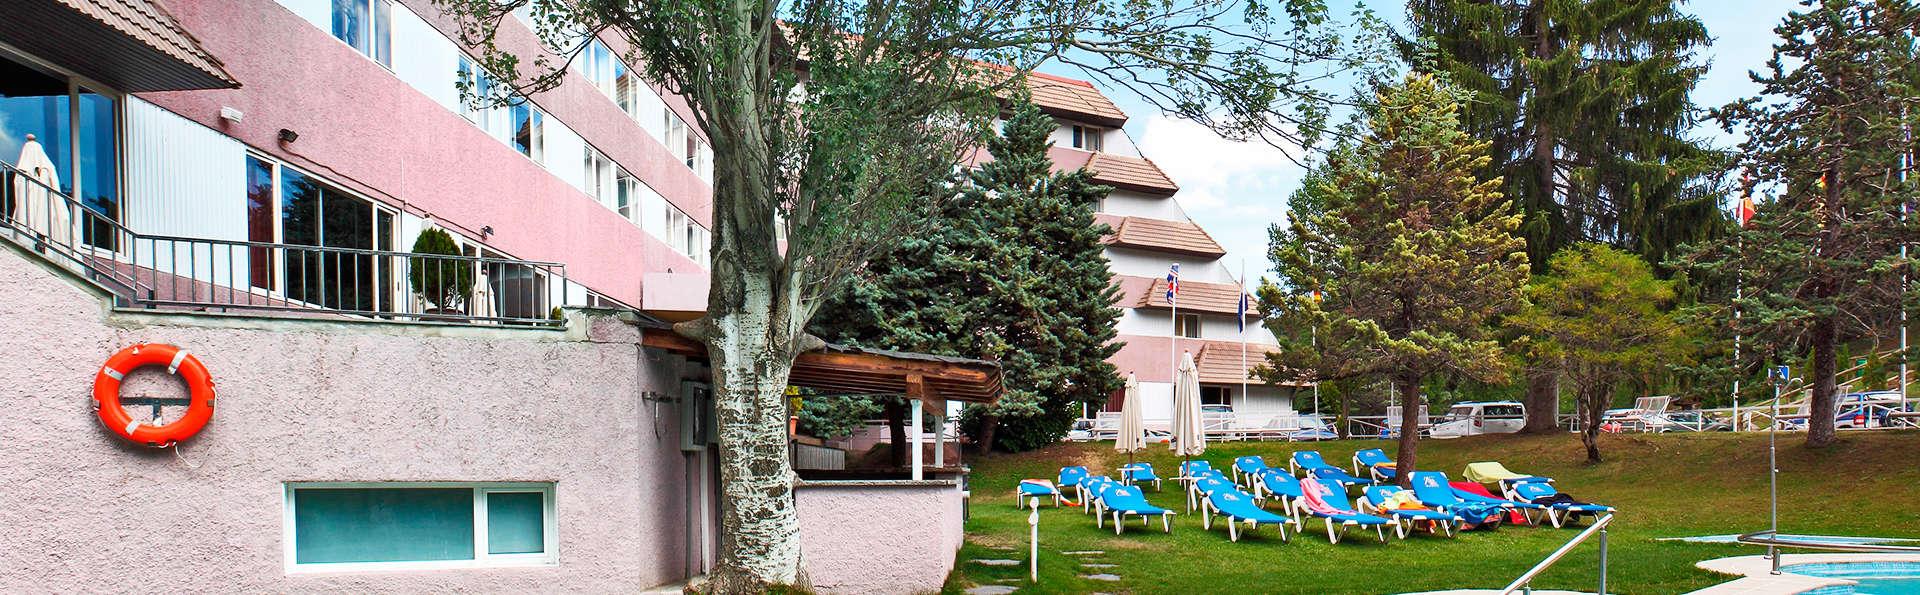 Alp Hotel Masella - EDIT_pool.jpg